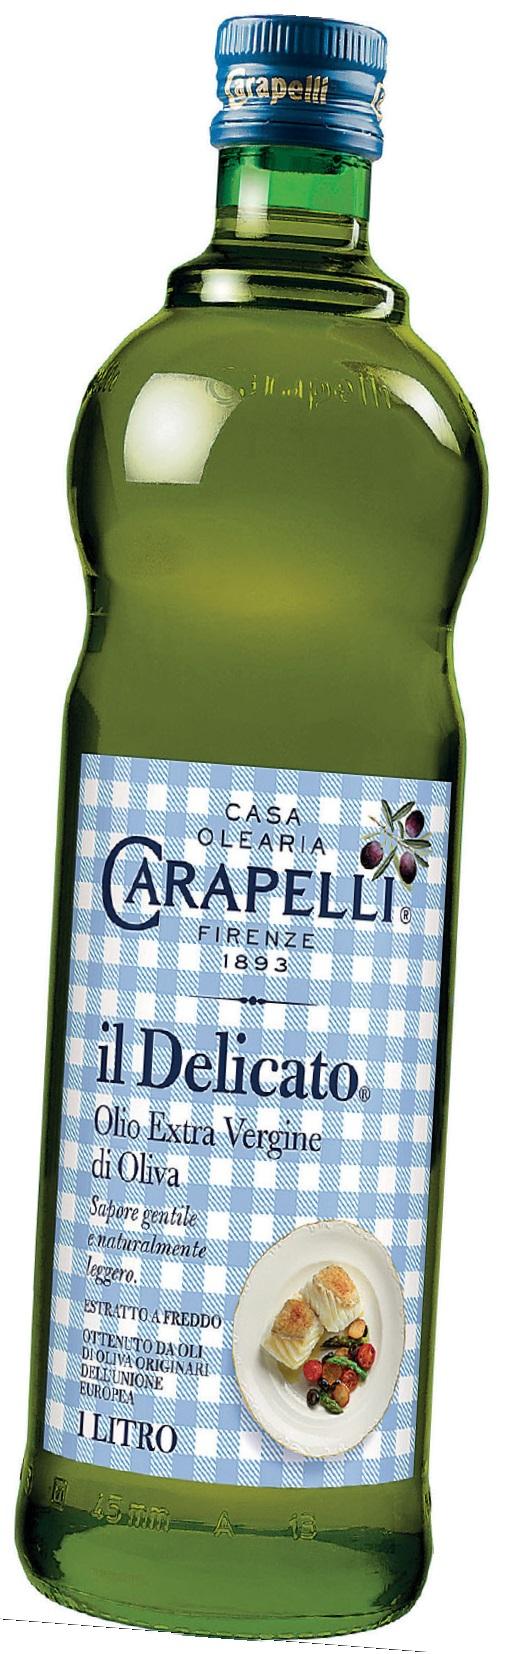 Olio extra vergine d'oliva il delicato Carapelli